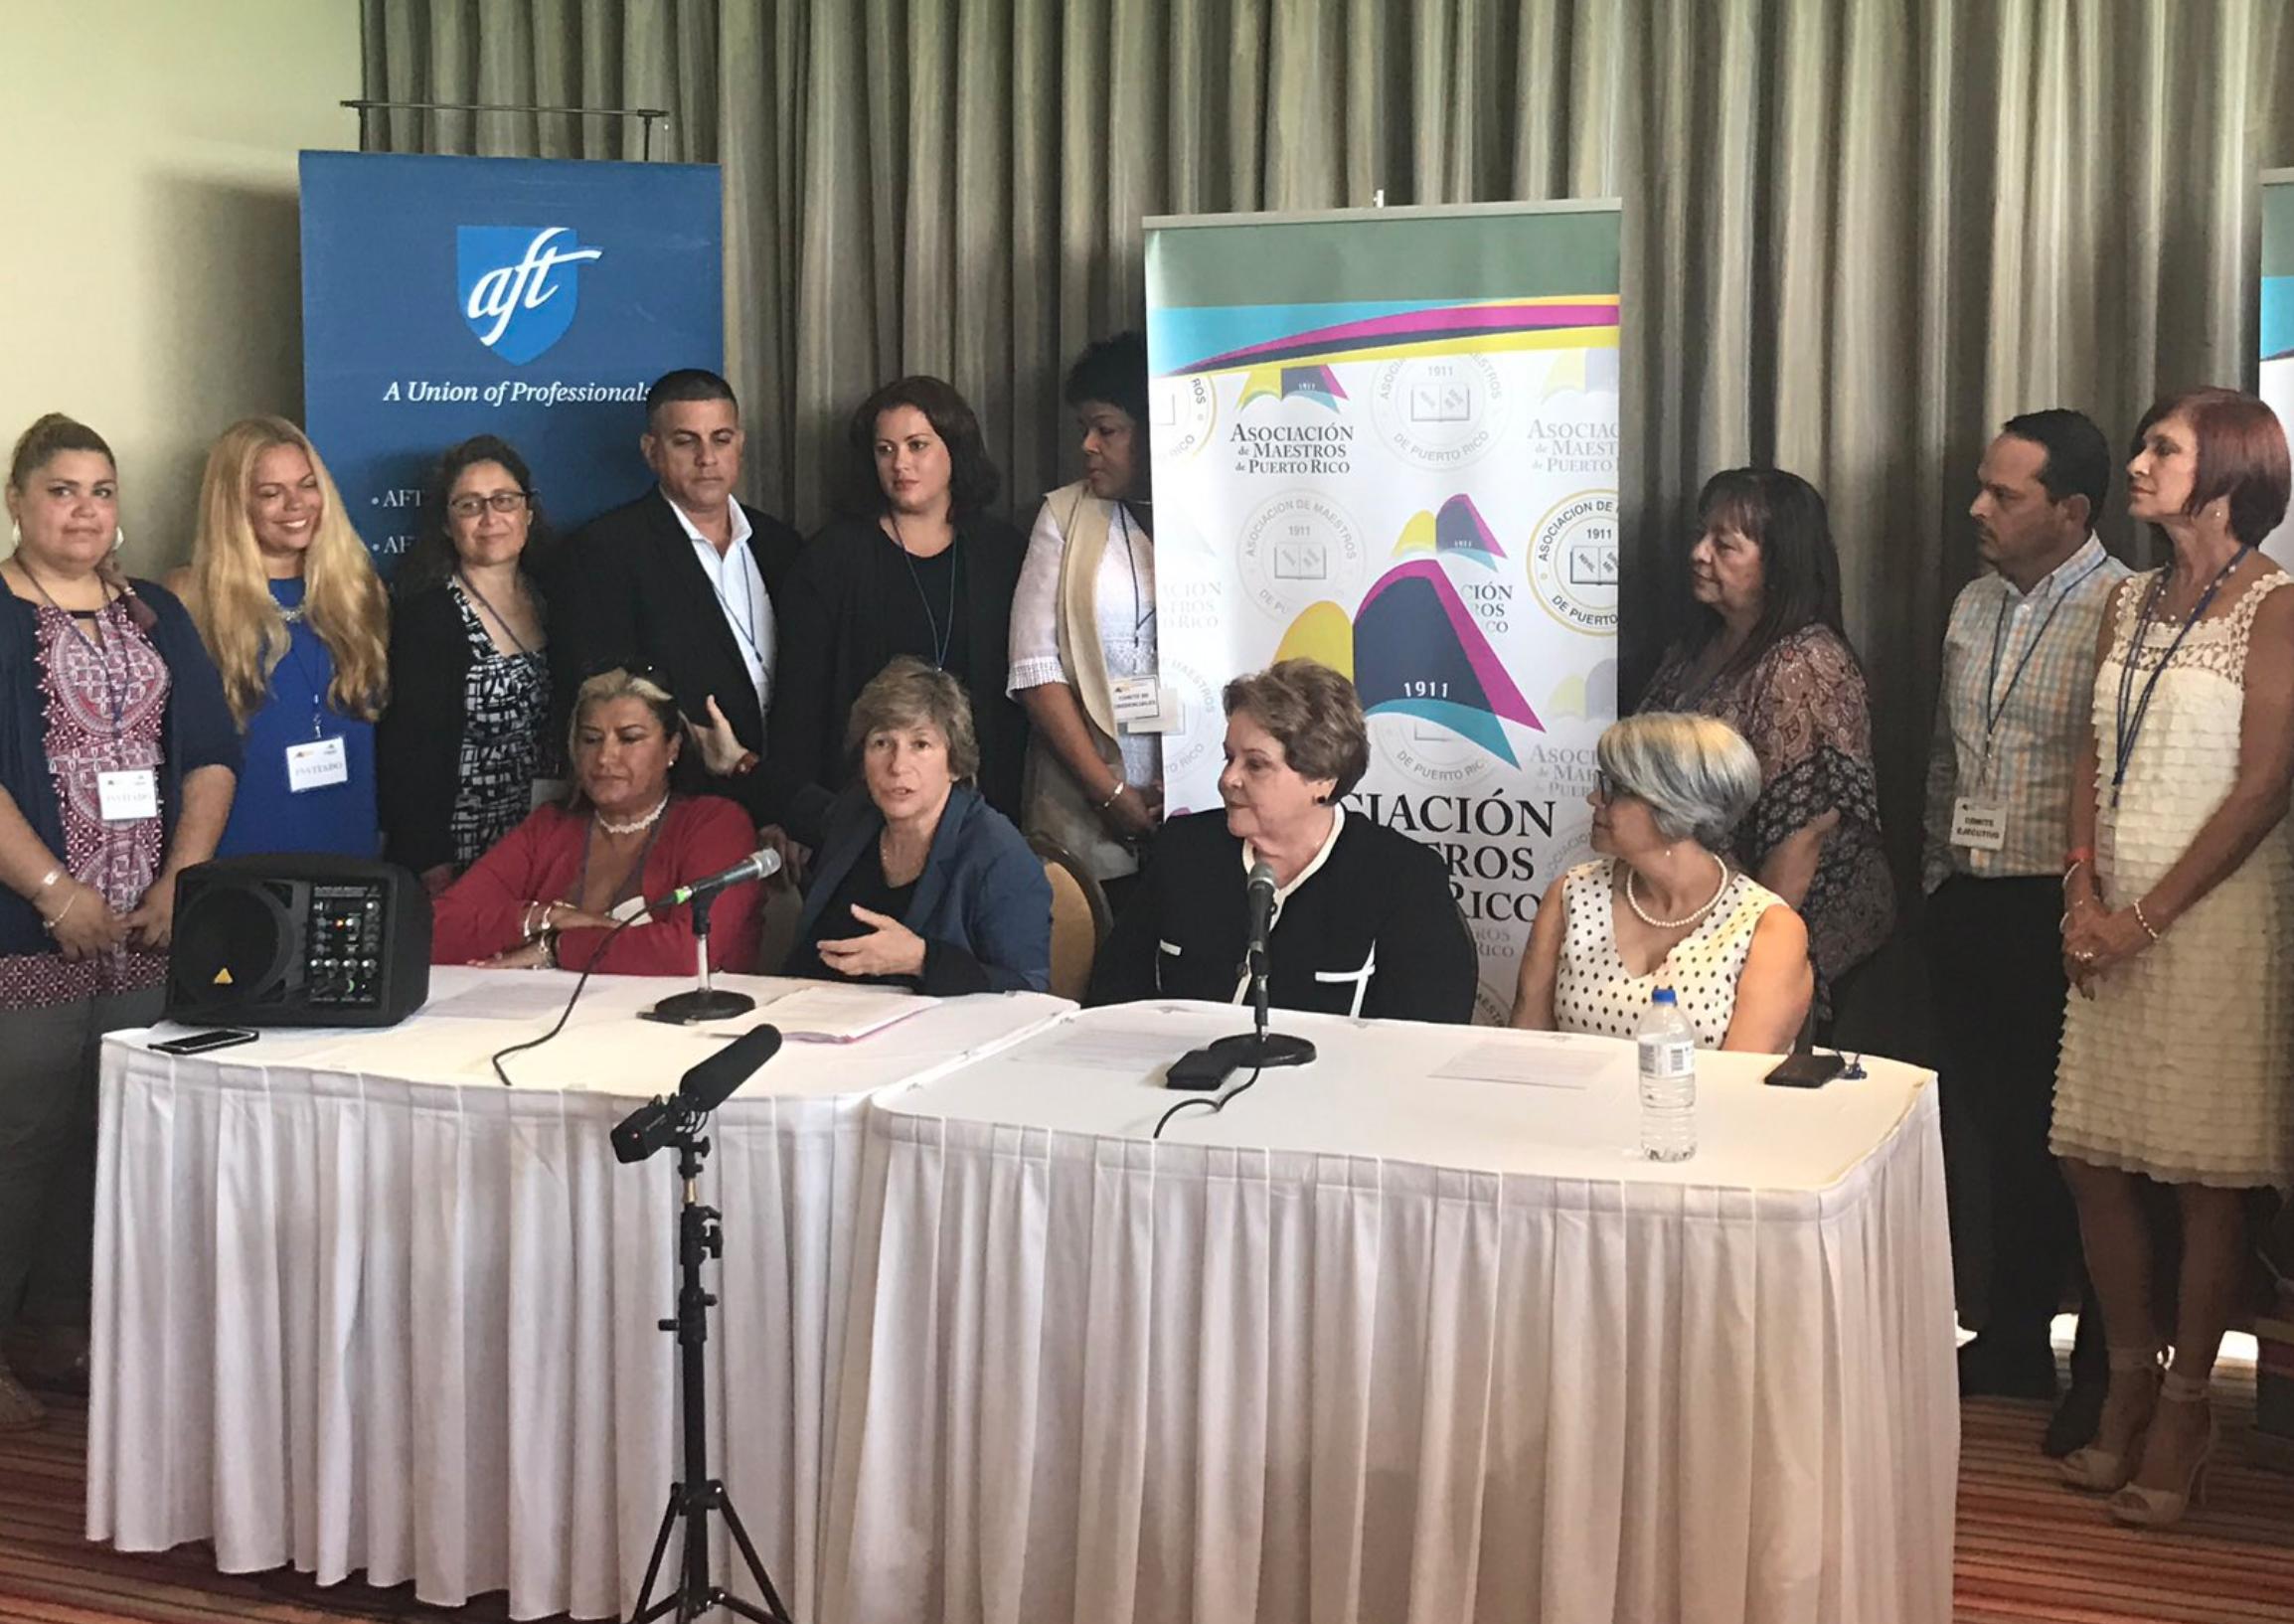 Press conference in Puerto Rico